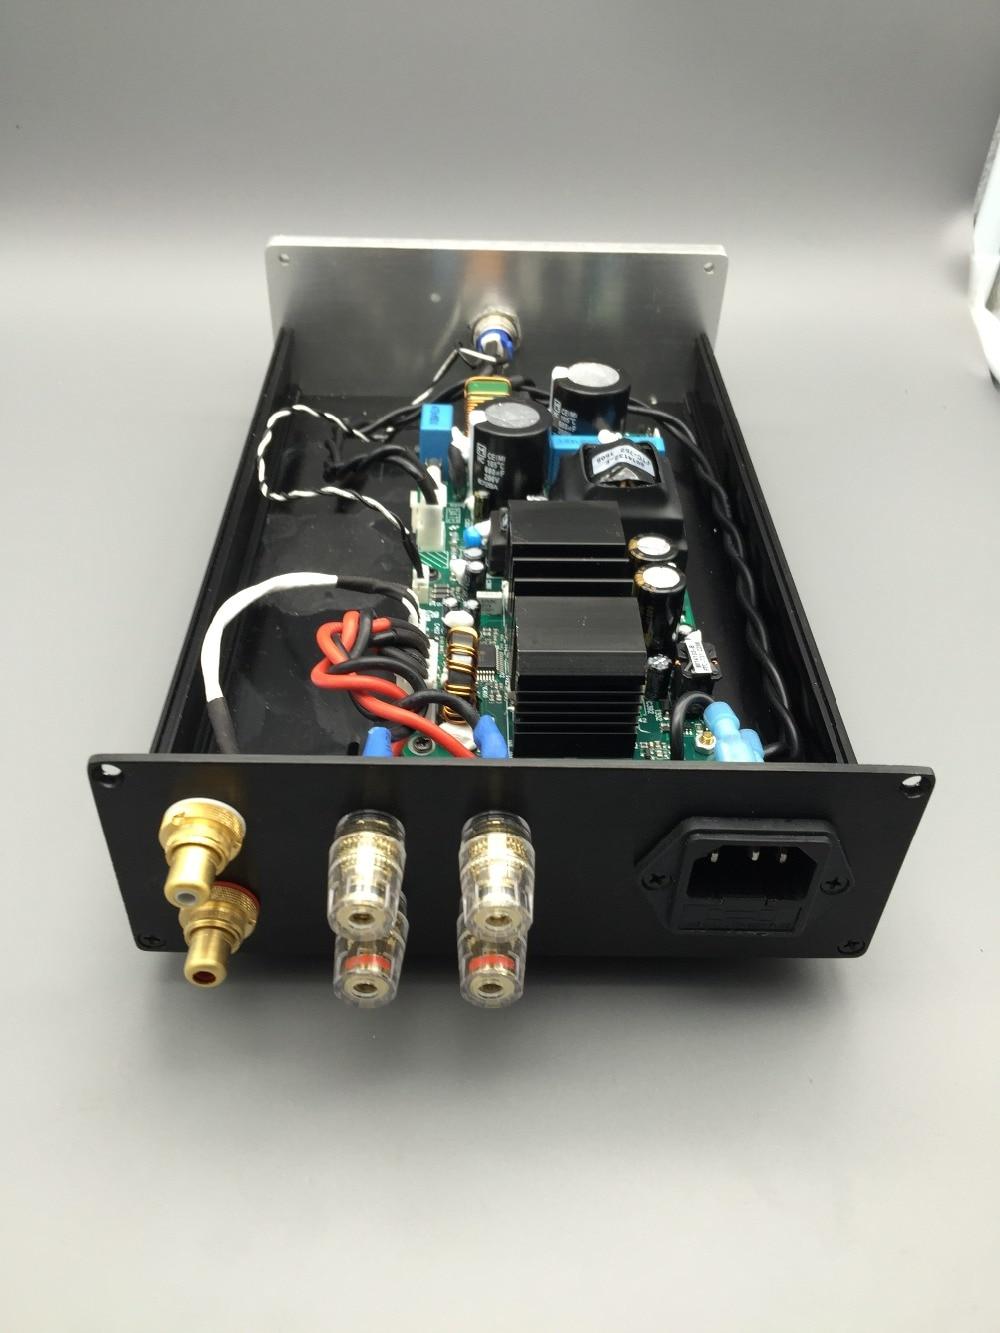 ICEPOWER power amplifier accessories digital power amplifier module ICE125ASX2 professional grade hifi power amplifier